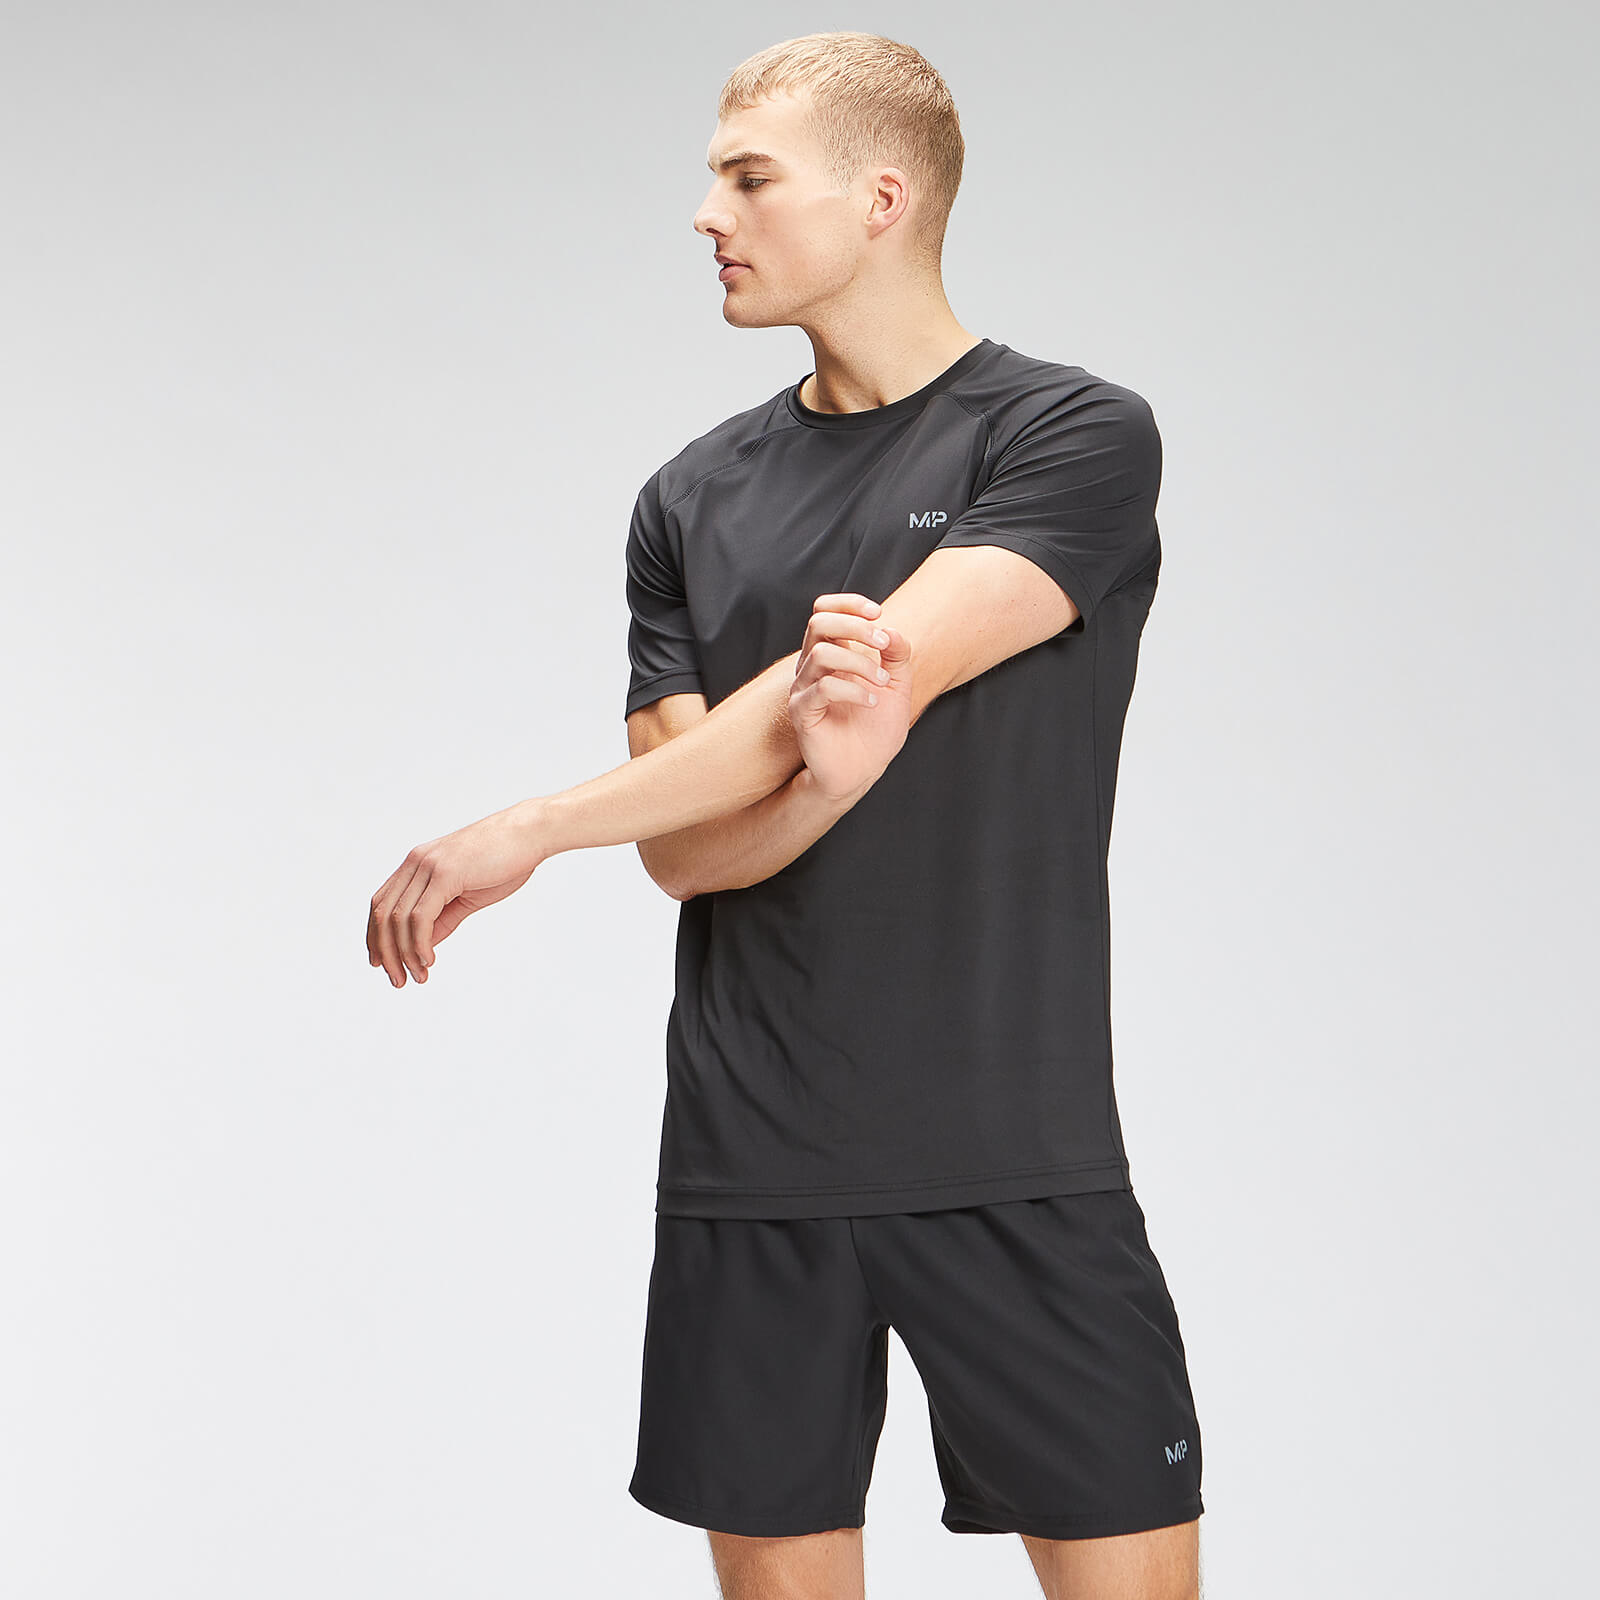 Купить MP Men's Repeat Graphic Training Short Sleeve T-Shirt - Black - XXXL, Myprotein International